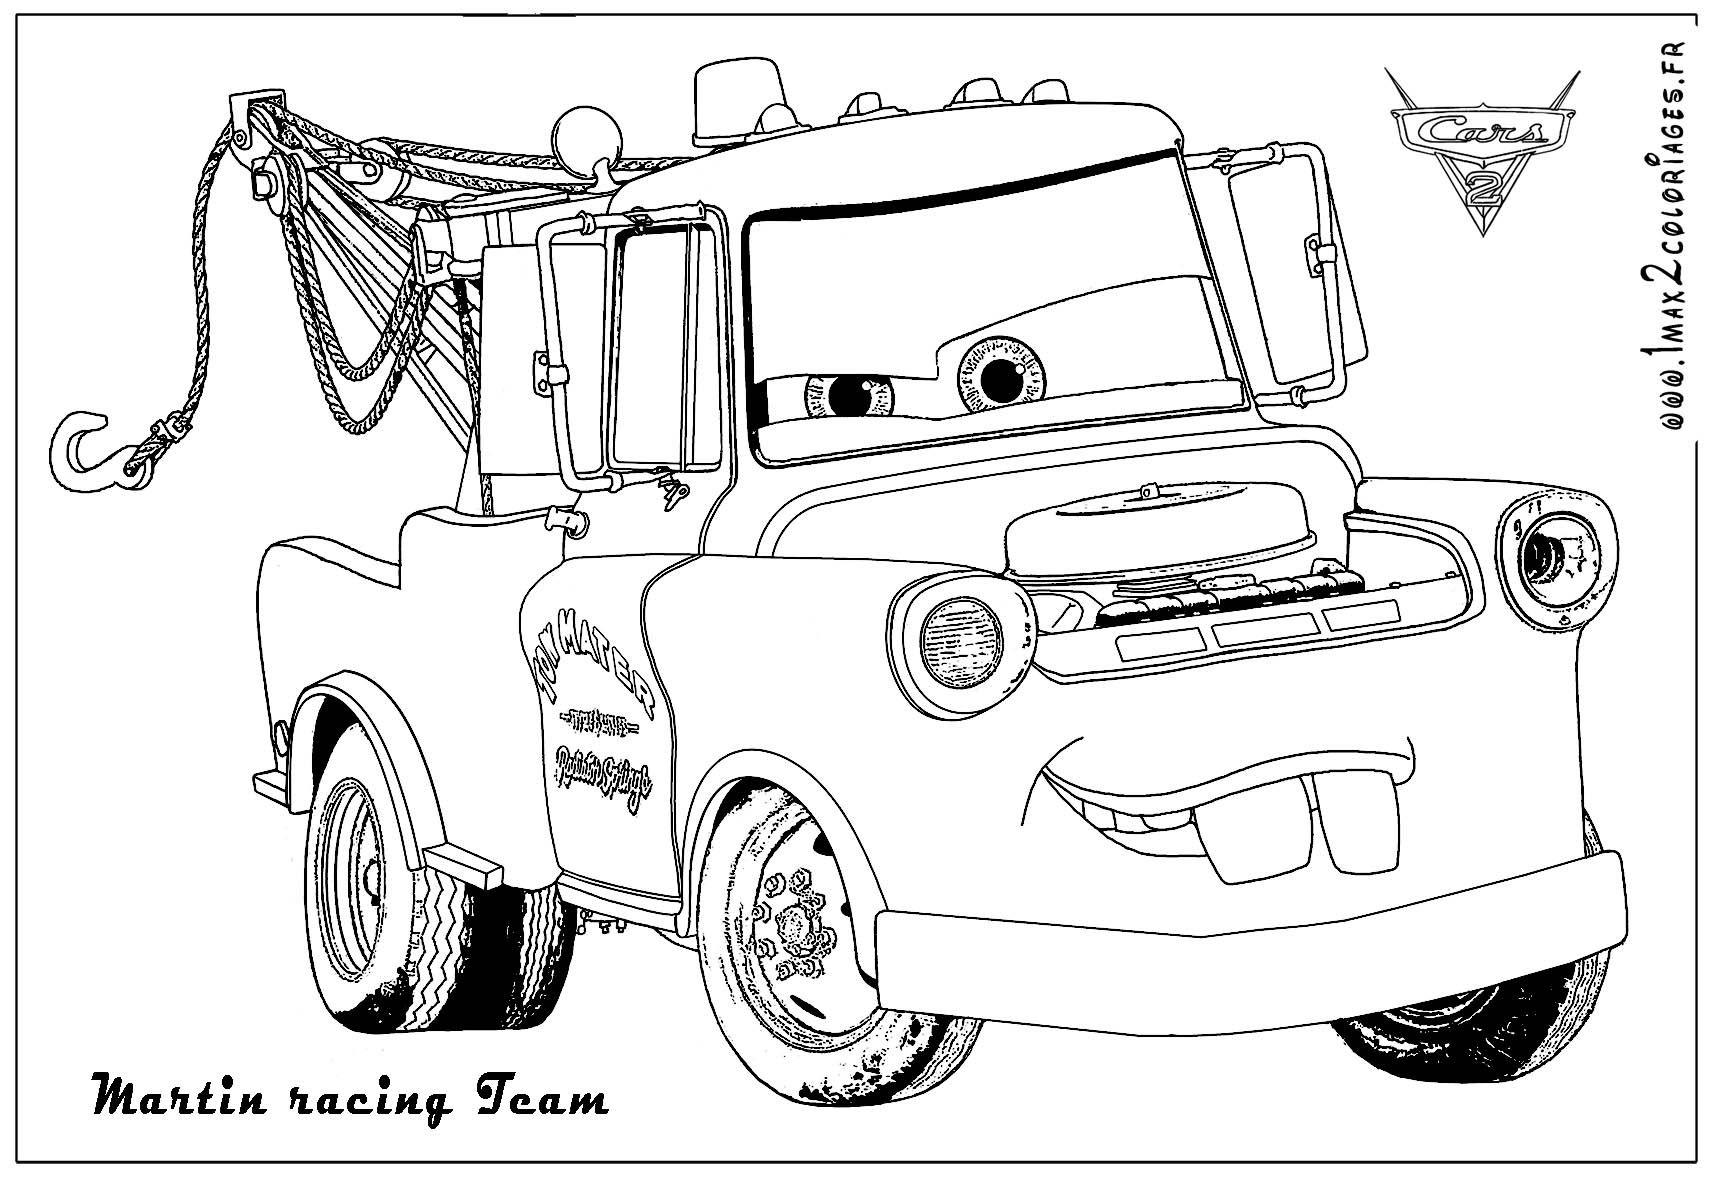 Coloriage Voiture Cars 2 Imprimer.Martin Racing Team Grande Image Dessin Dessin A Colorier